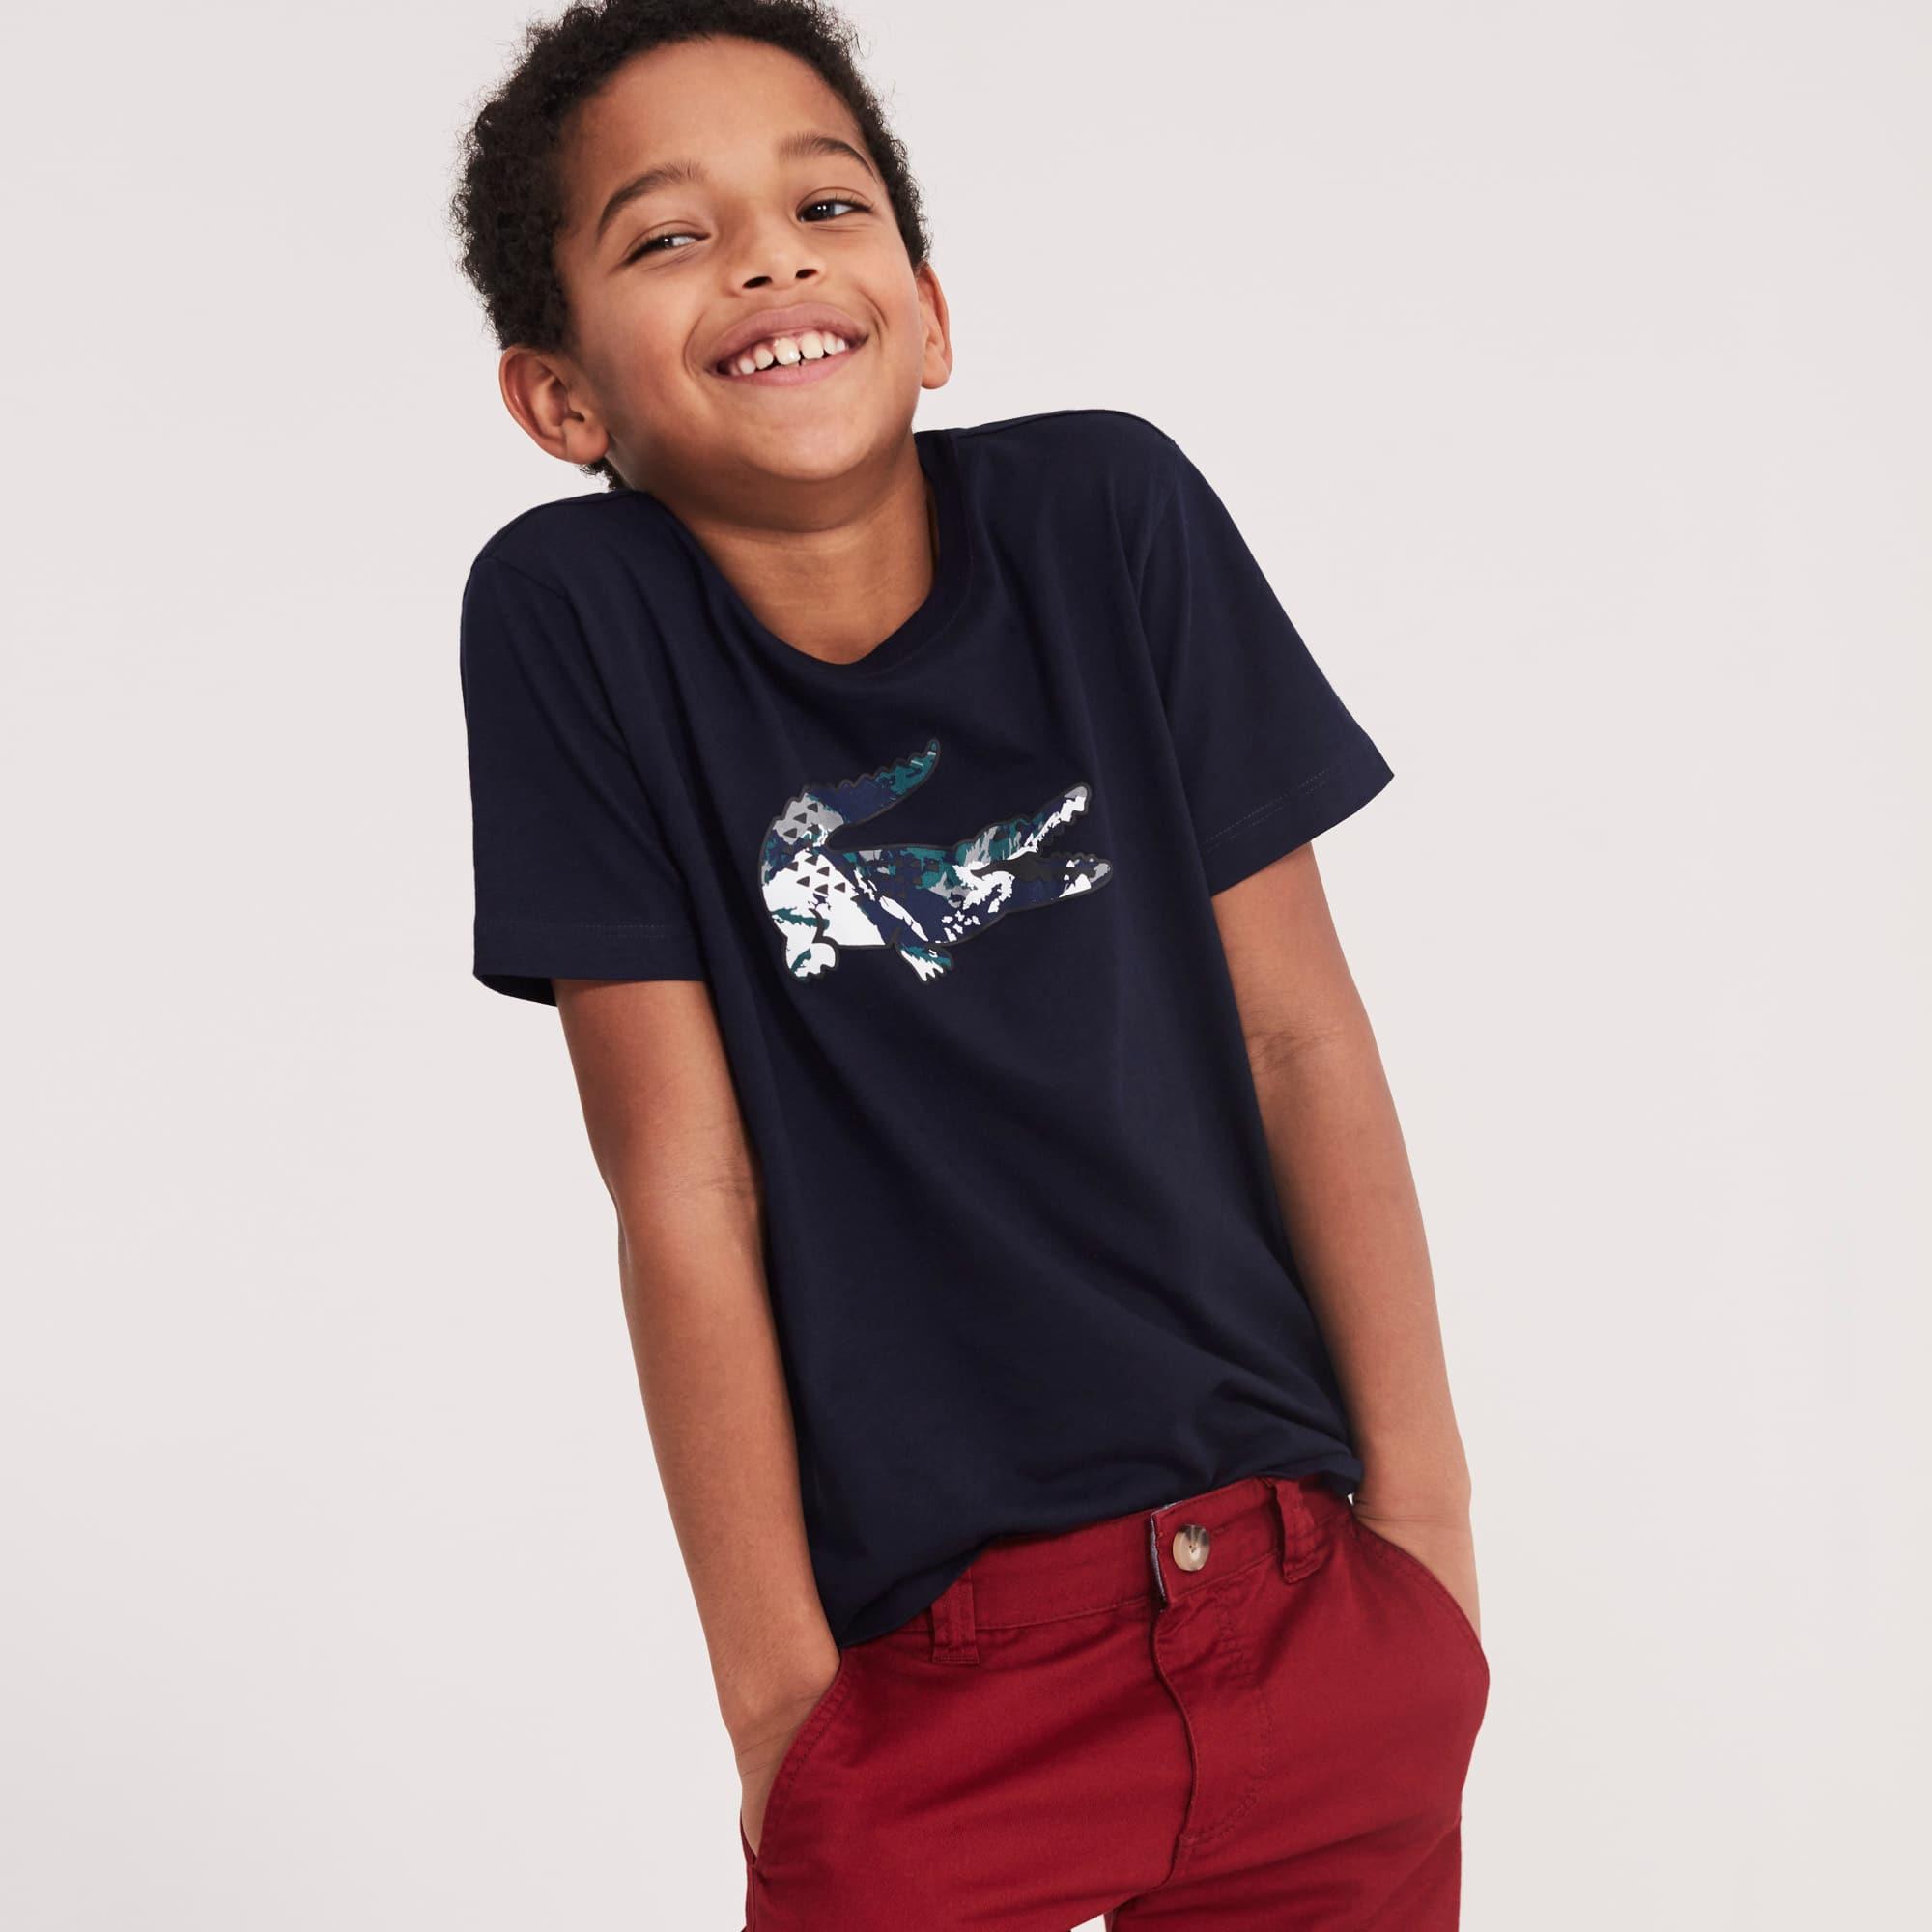 Jungen T-Shirt aus Baumwolljersey mit großem Krokodil